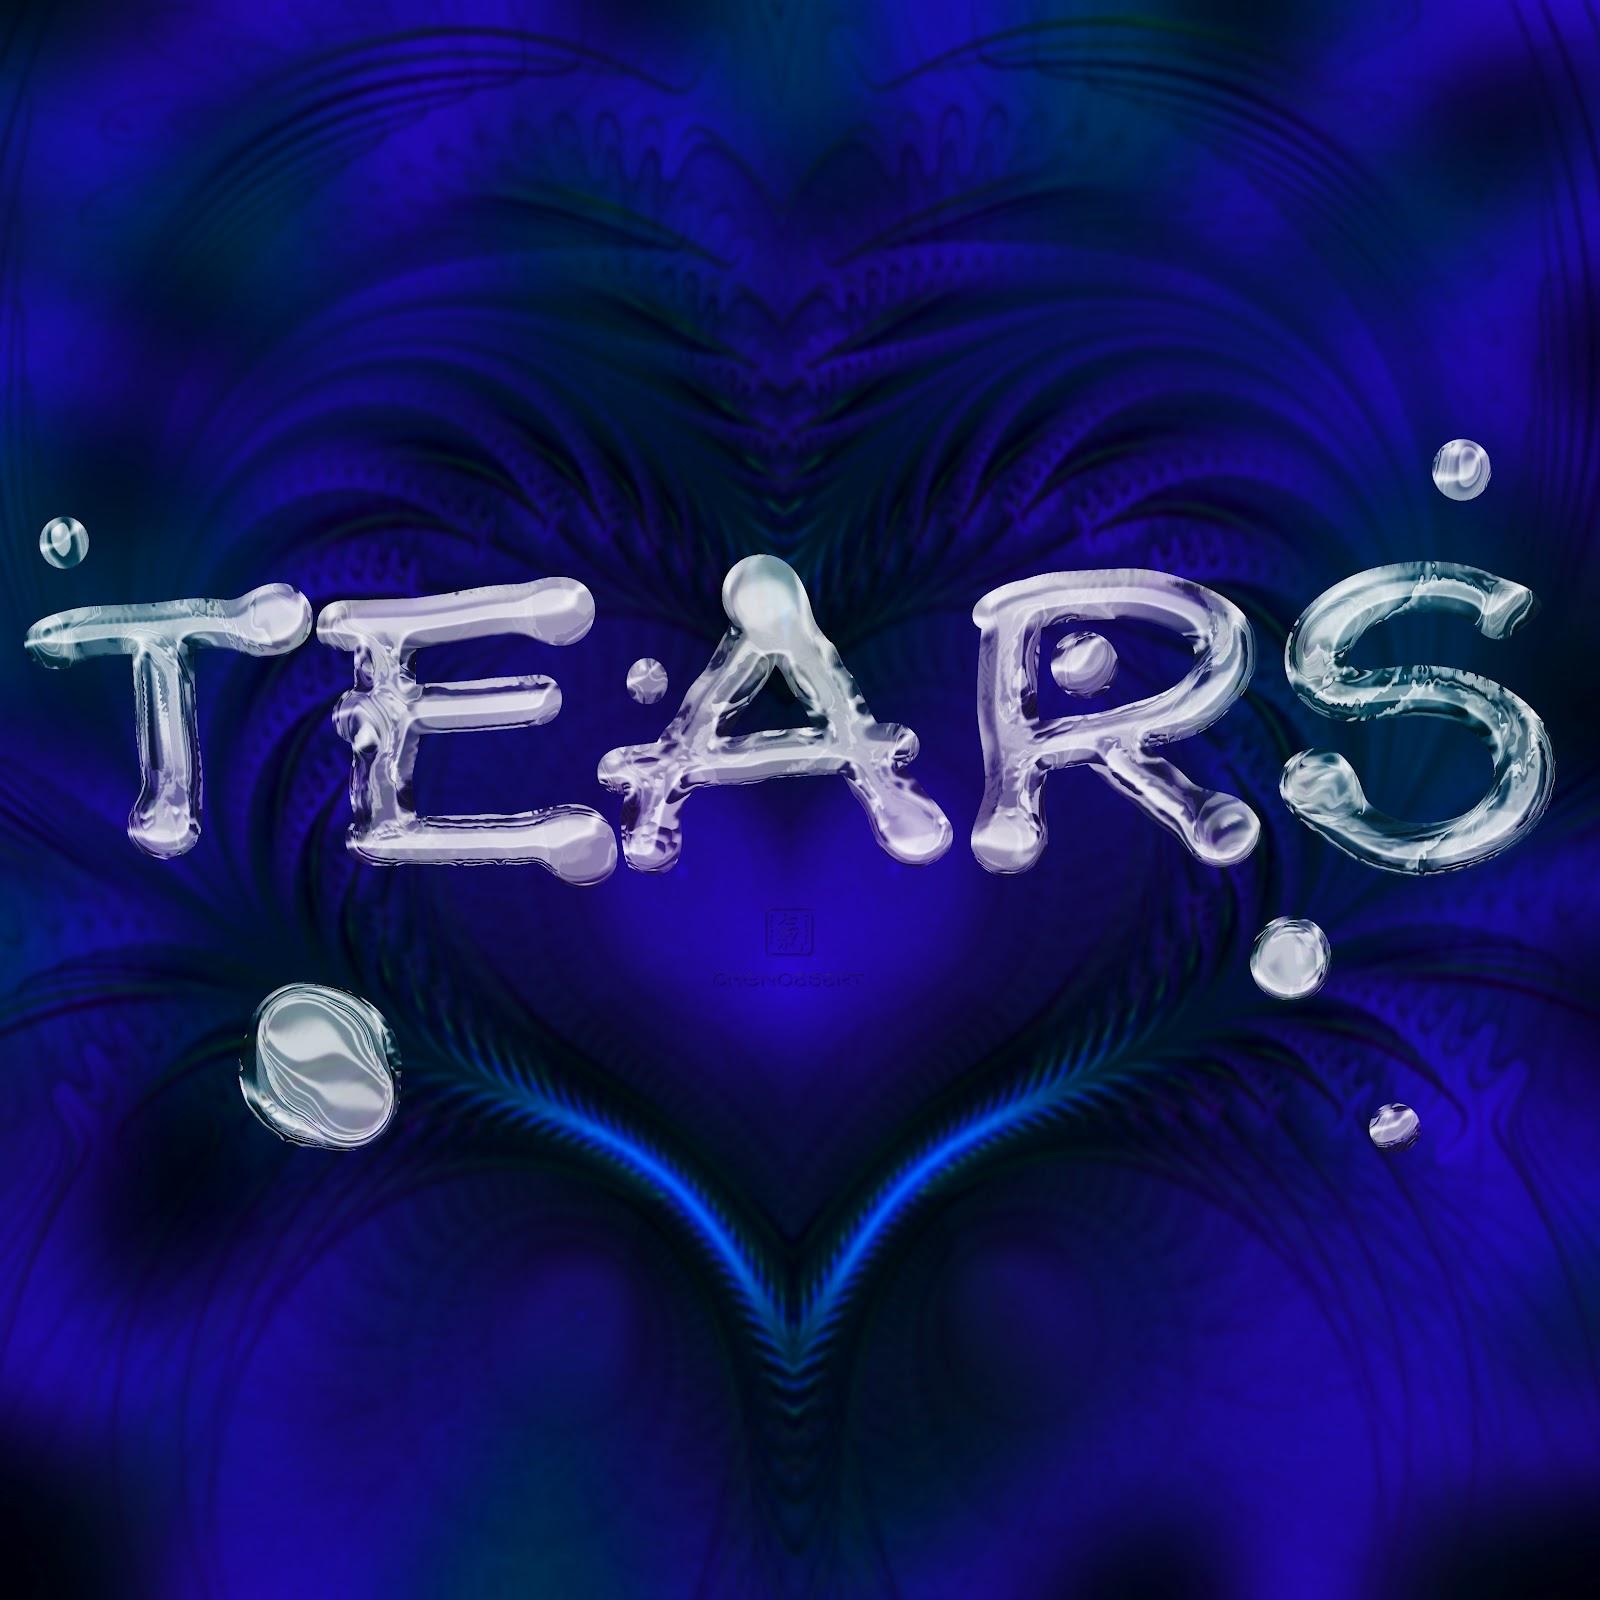 tears wallpaper - photo #22